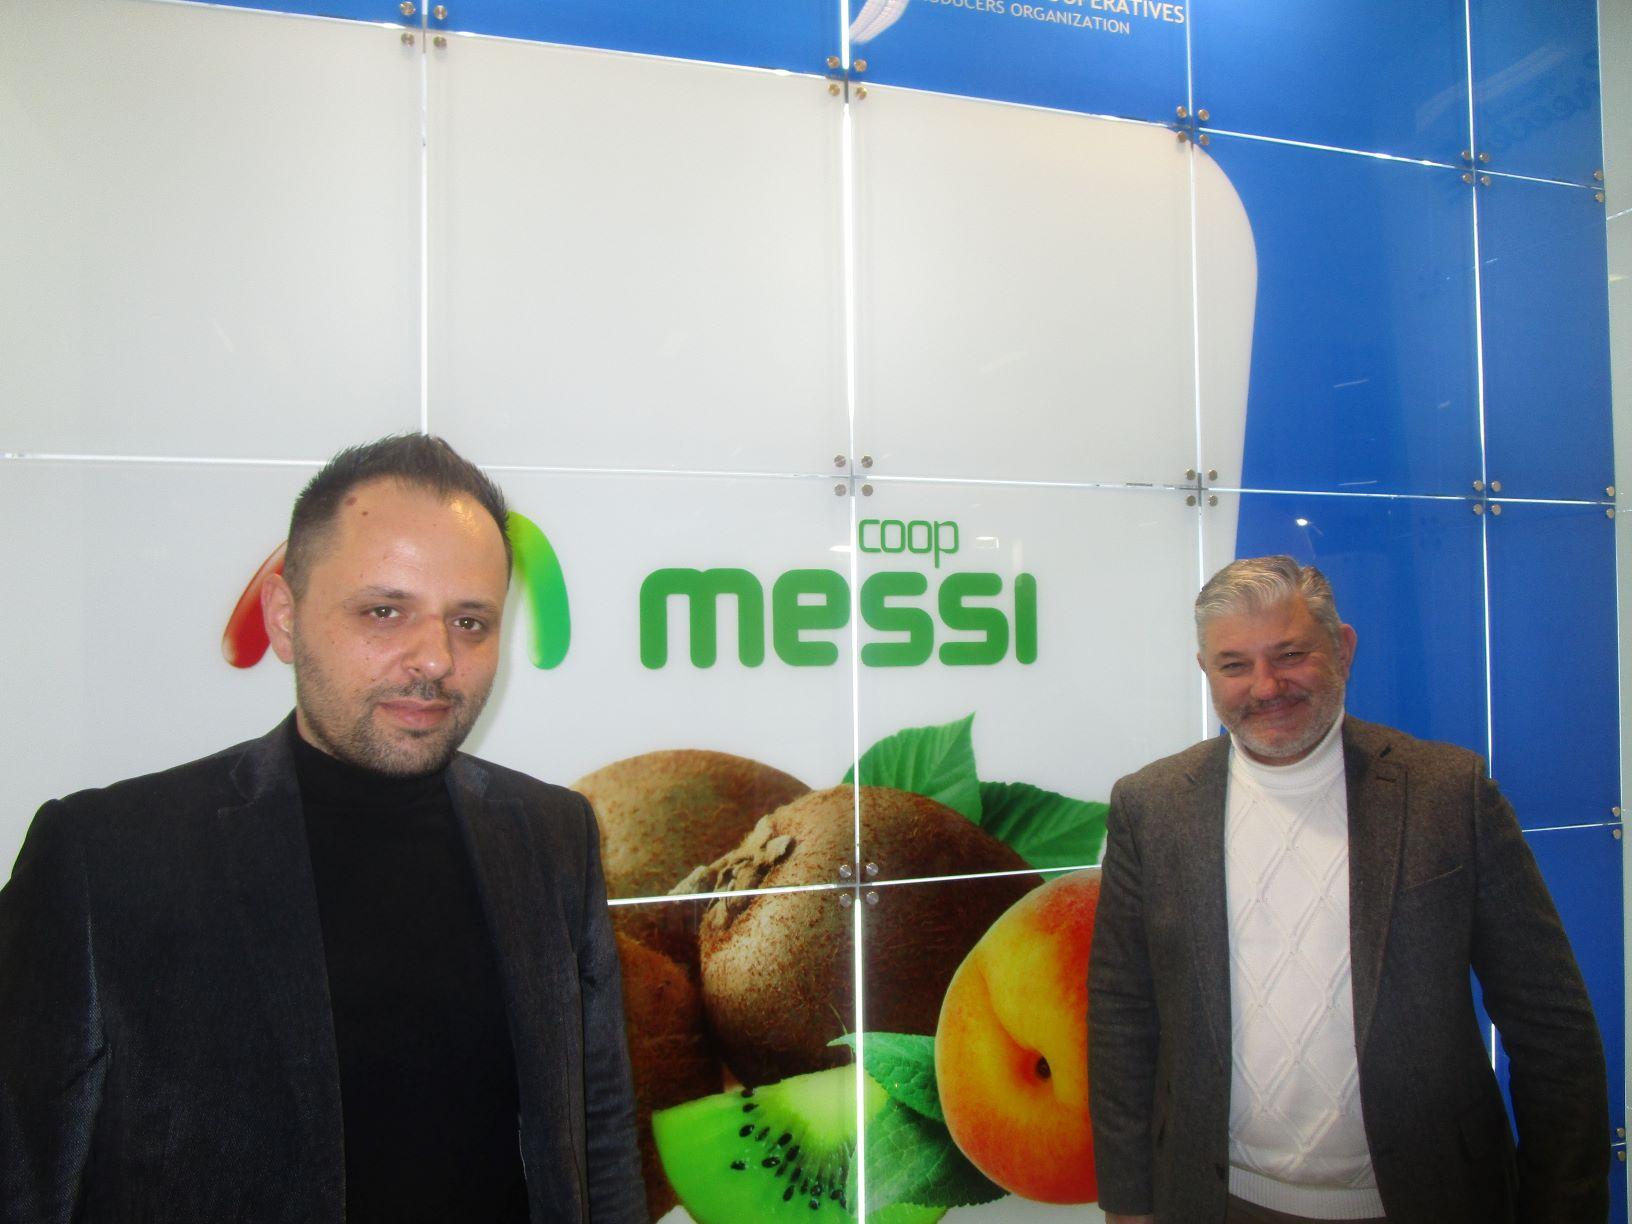 Coop Messi brings more varietal innovation and sustainable packaging